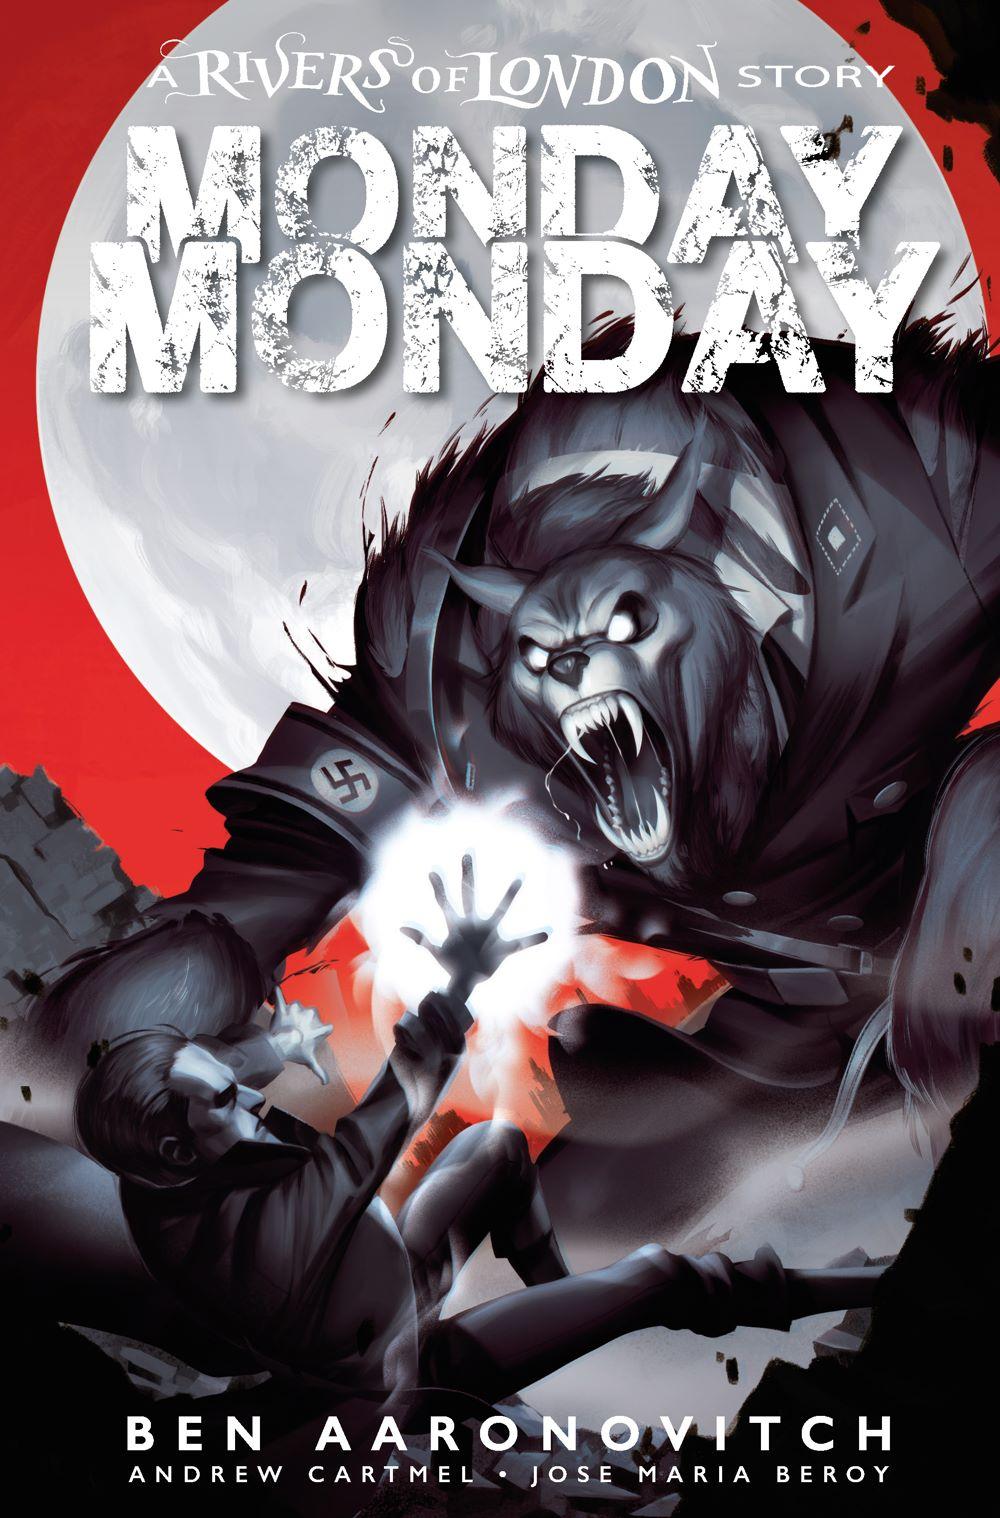 RoL_MM_2_COVER_C_CLAREY.jpg Titan Comics August 2021 Solicitations